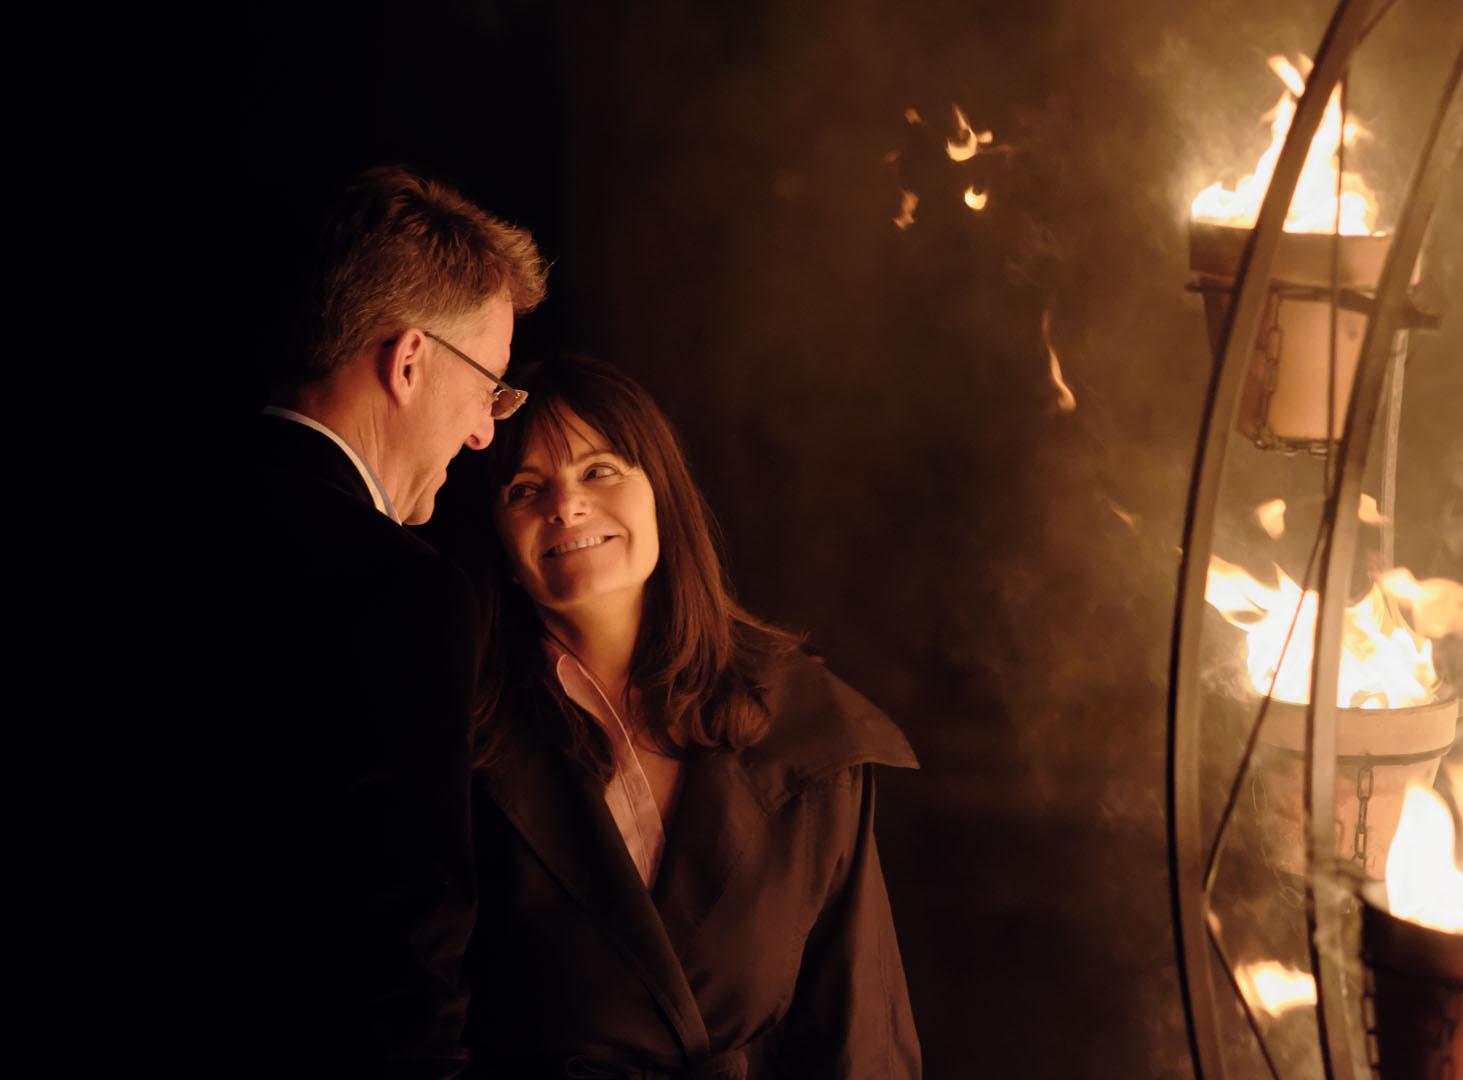 Firelight Romance